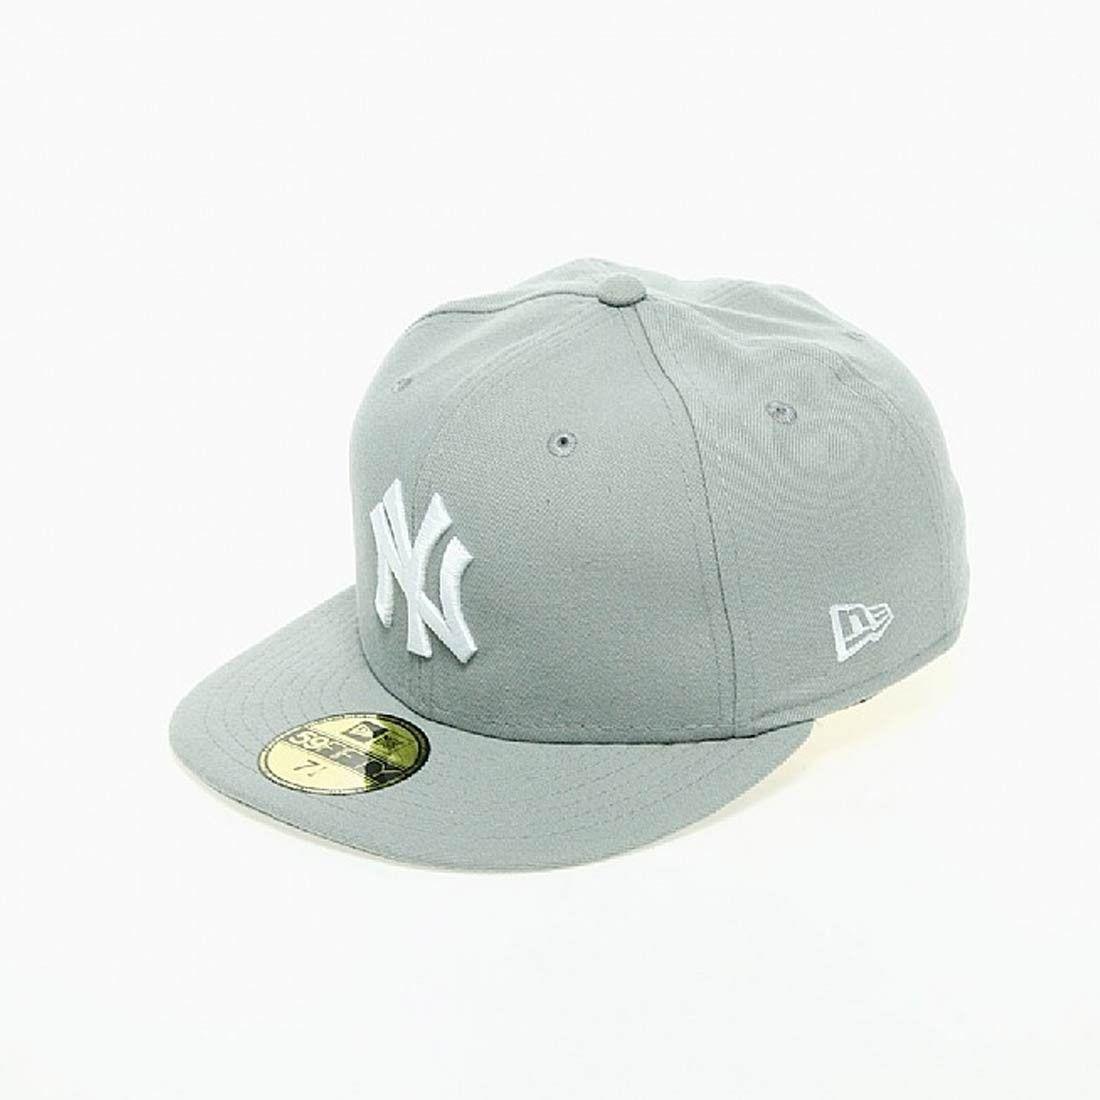 Gorra Cap New Era Basic NY Yankees League Basic 59FIFTY  ea1c2abb144